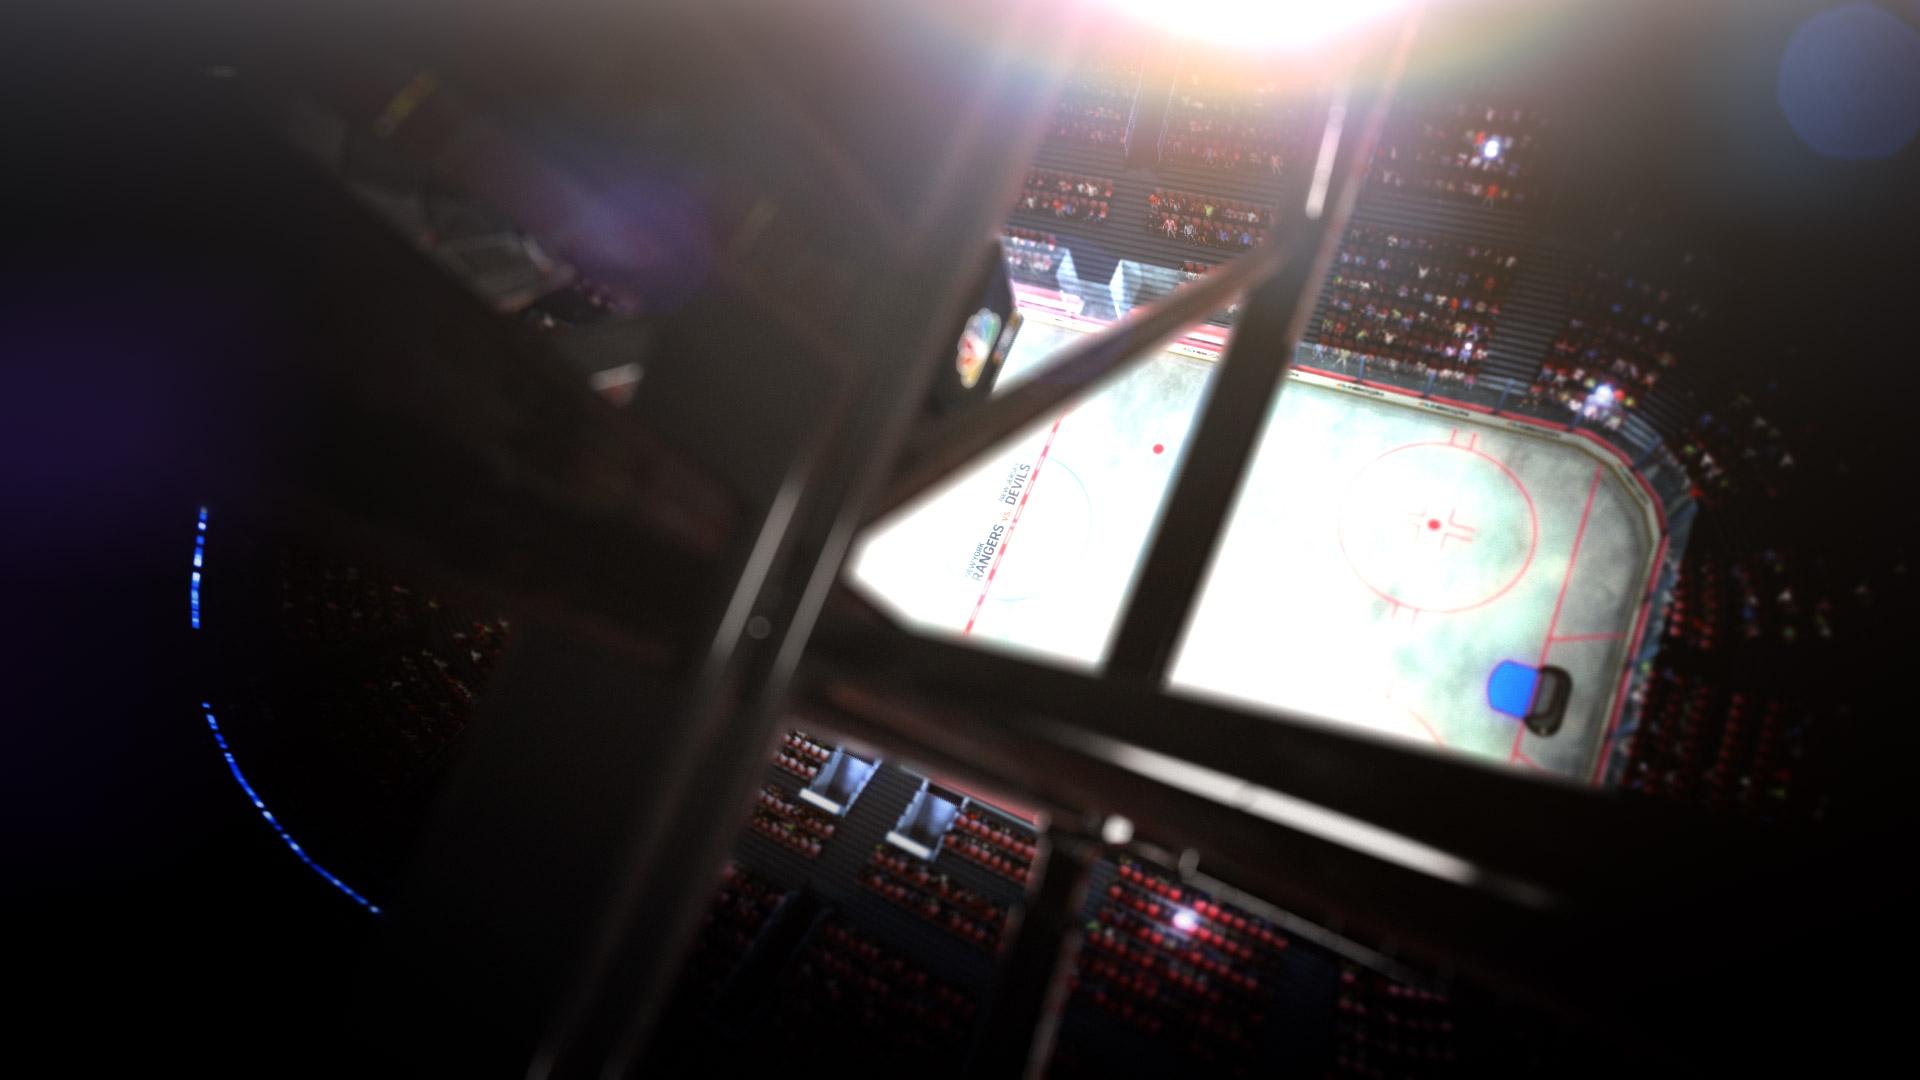 NBC_NHL_WORD_CITY_RENDER_29.97 (00050).jpg